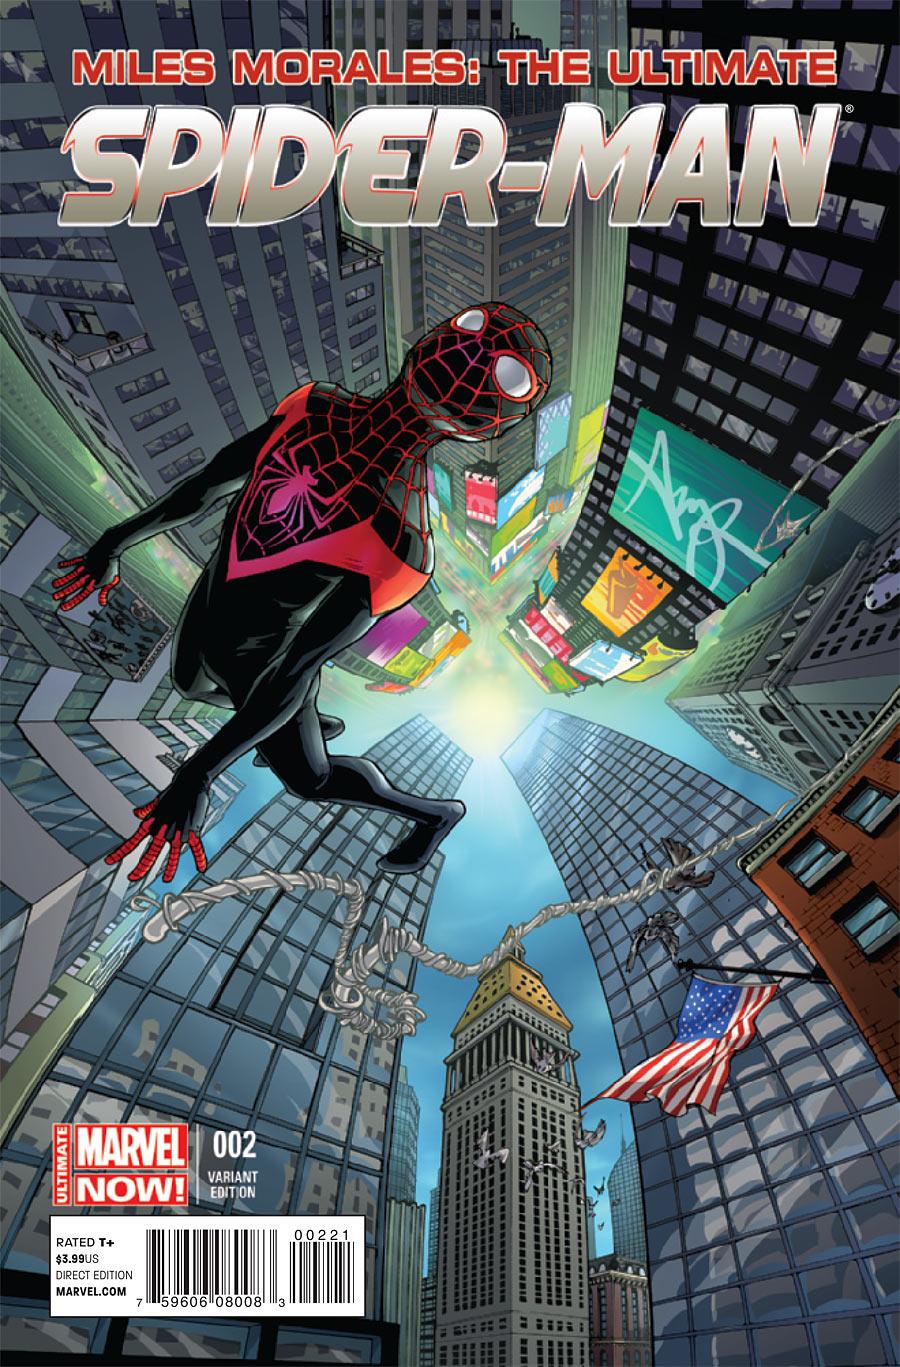 Miles Morales Spider-Man #3 Marvel Comics Movie 1:10 Variant